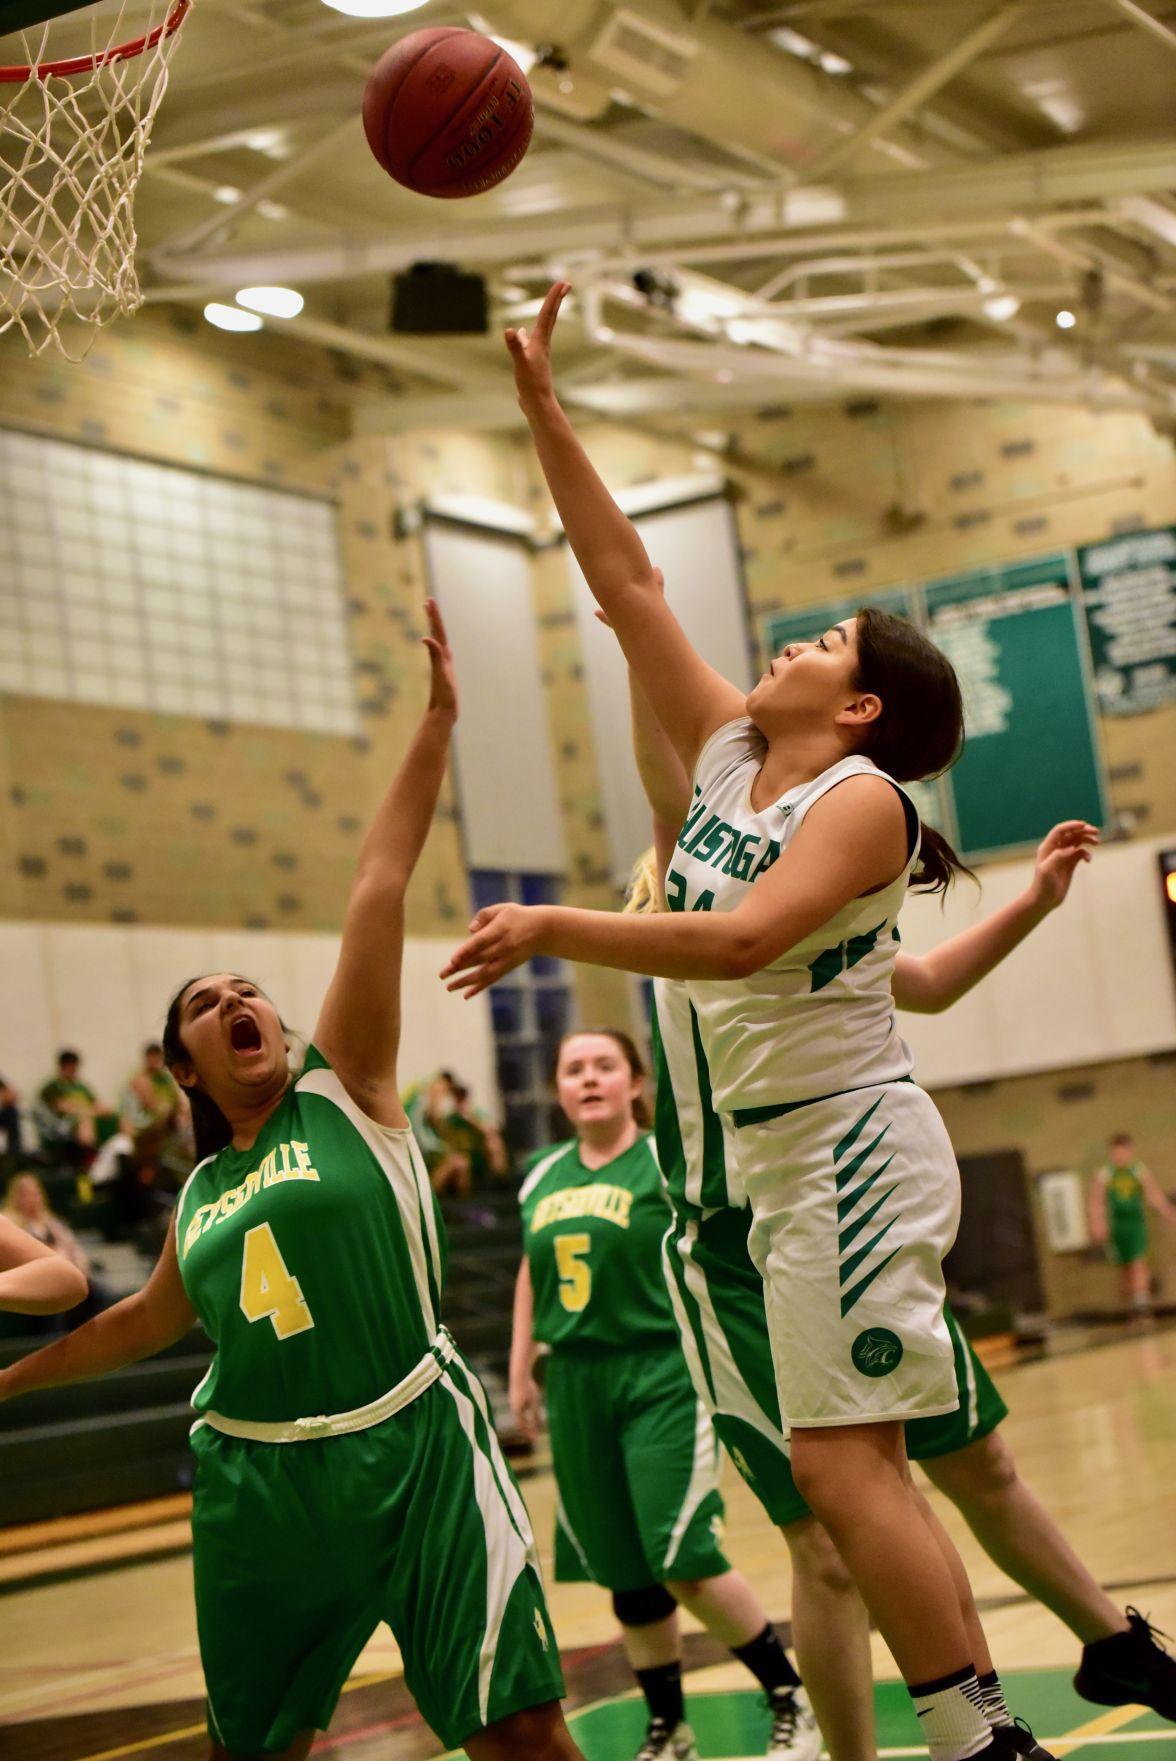 Calistoga High Basketball